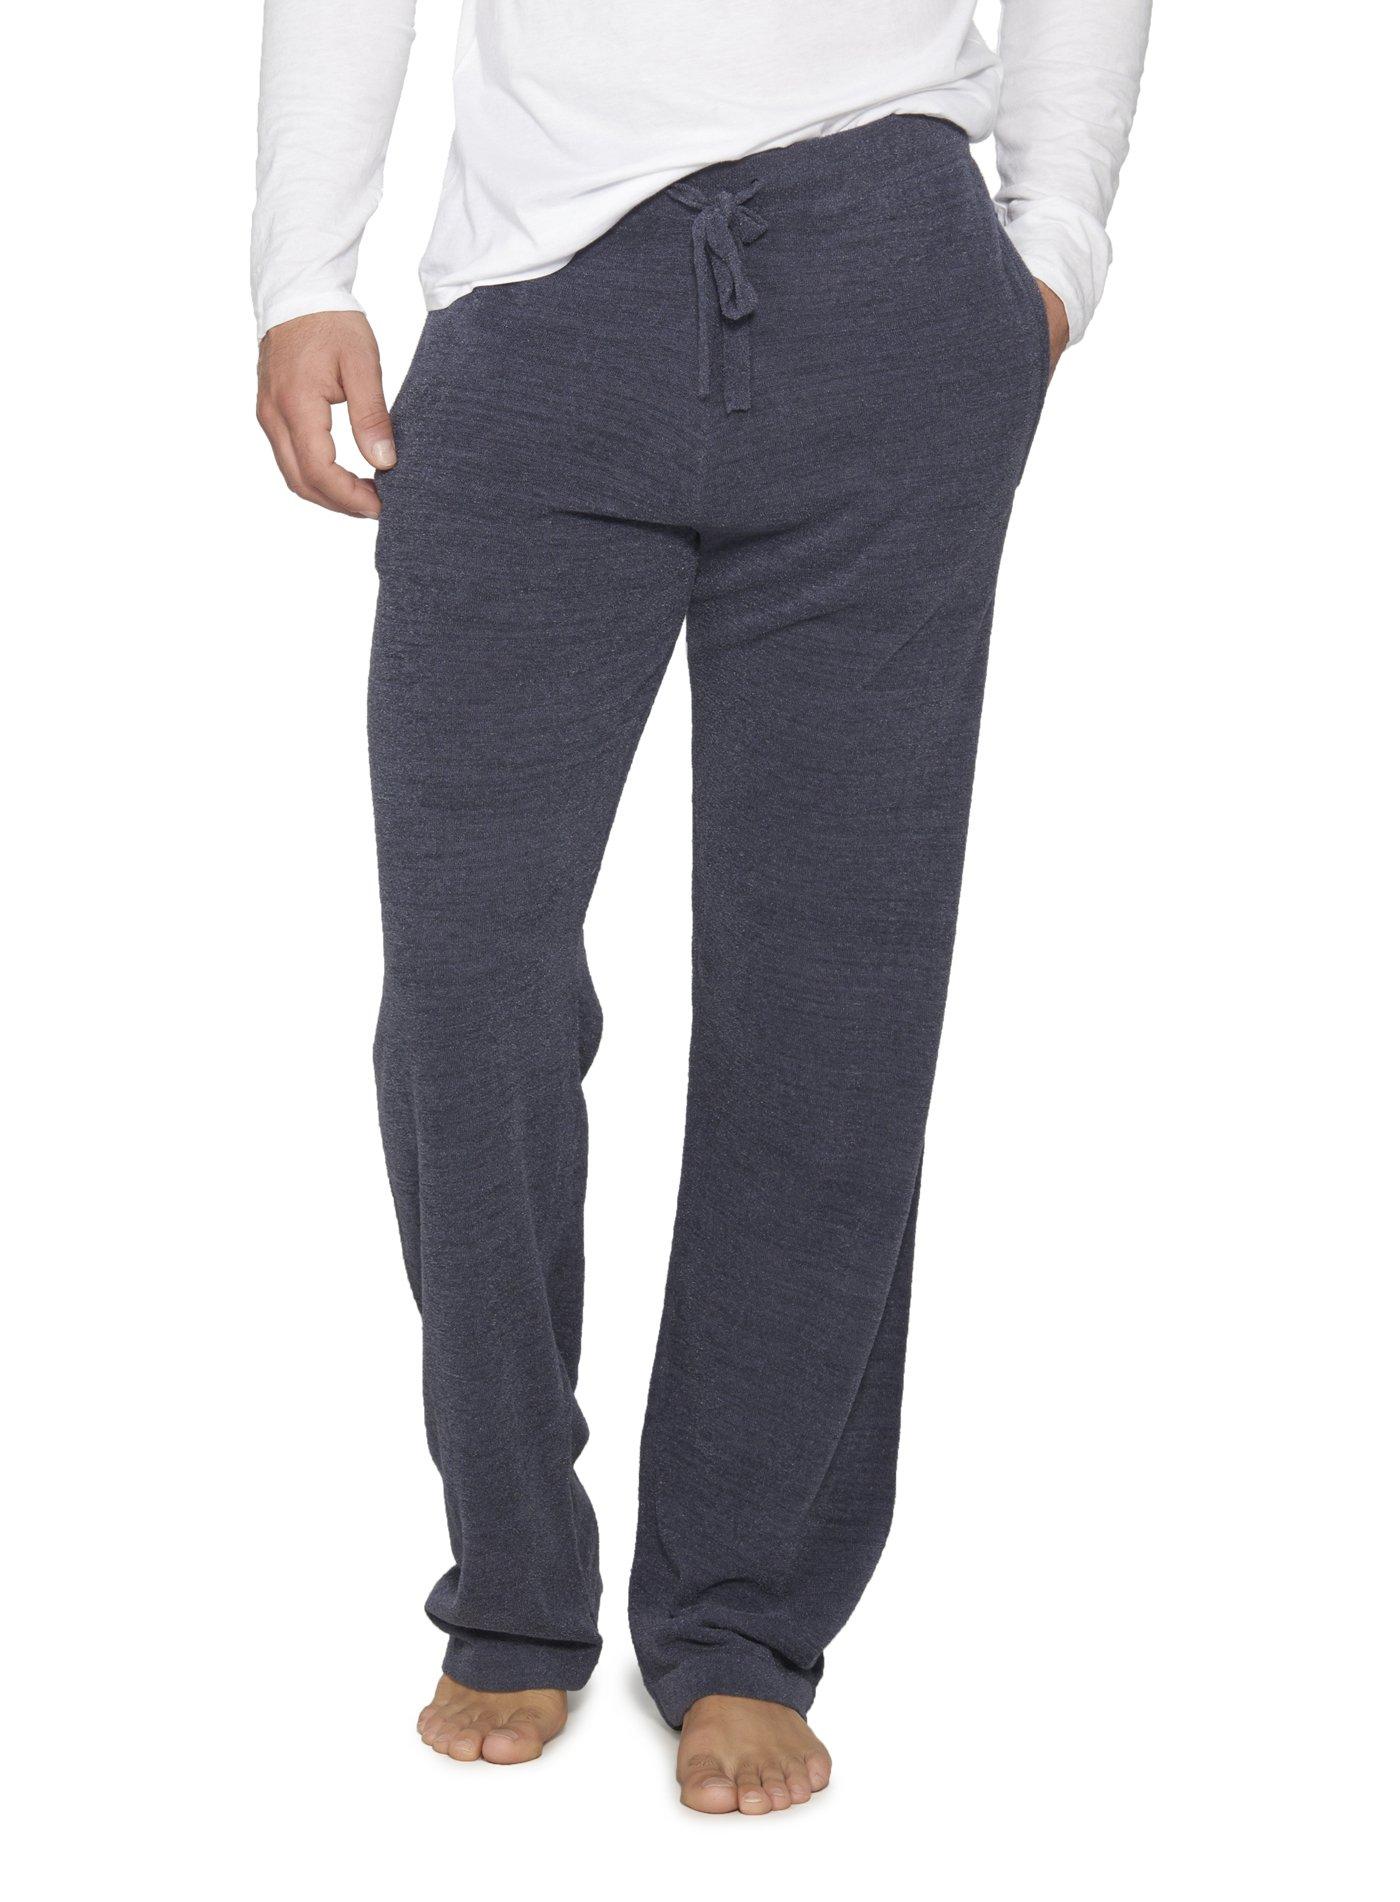 Barefoot Dreams CozyChic Ultra Lite Men's Lounge Pant - Carbon - Small